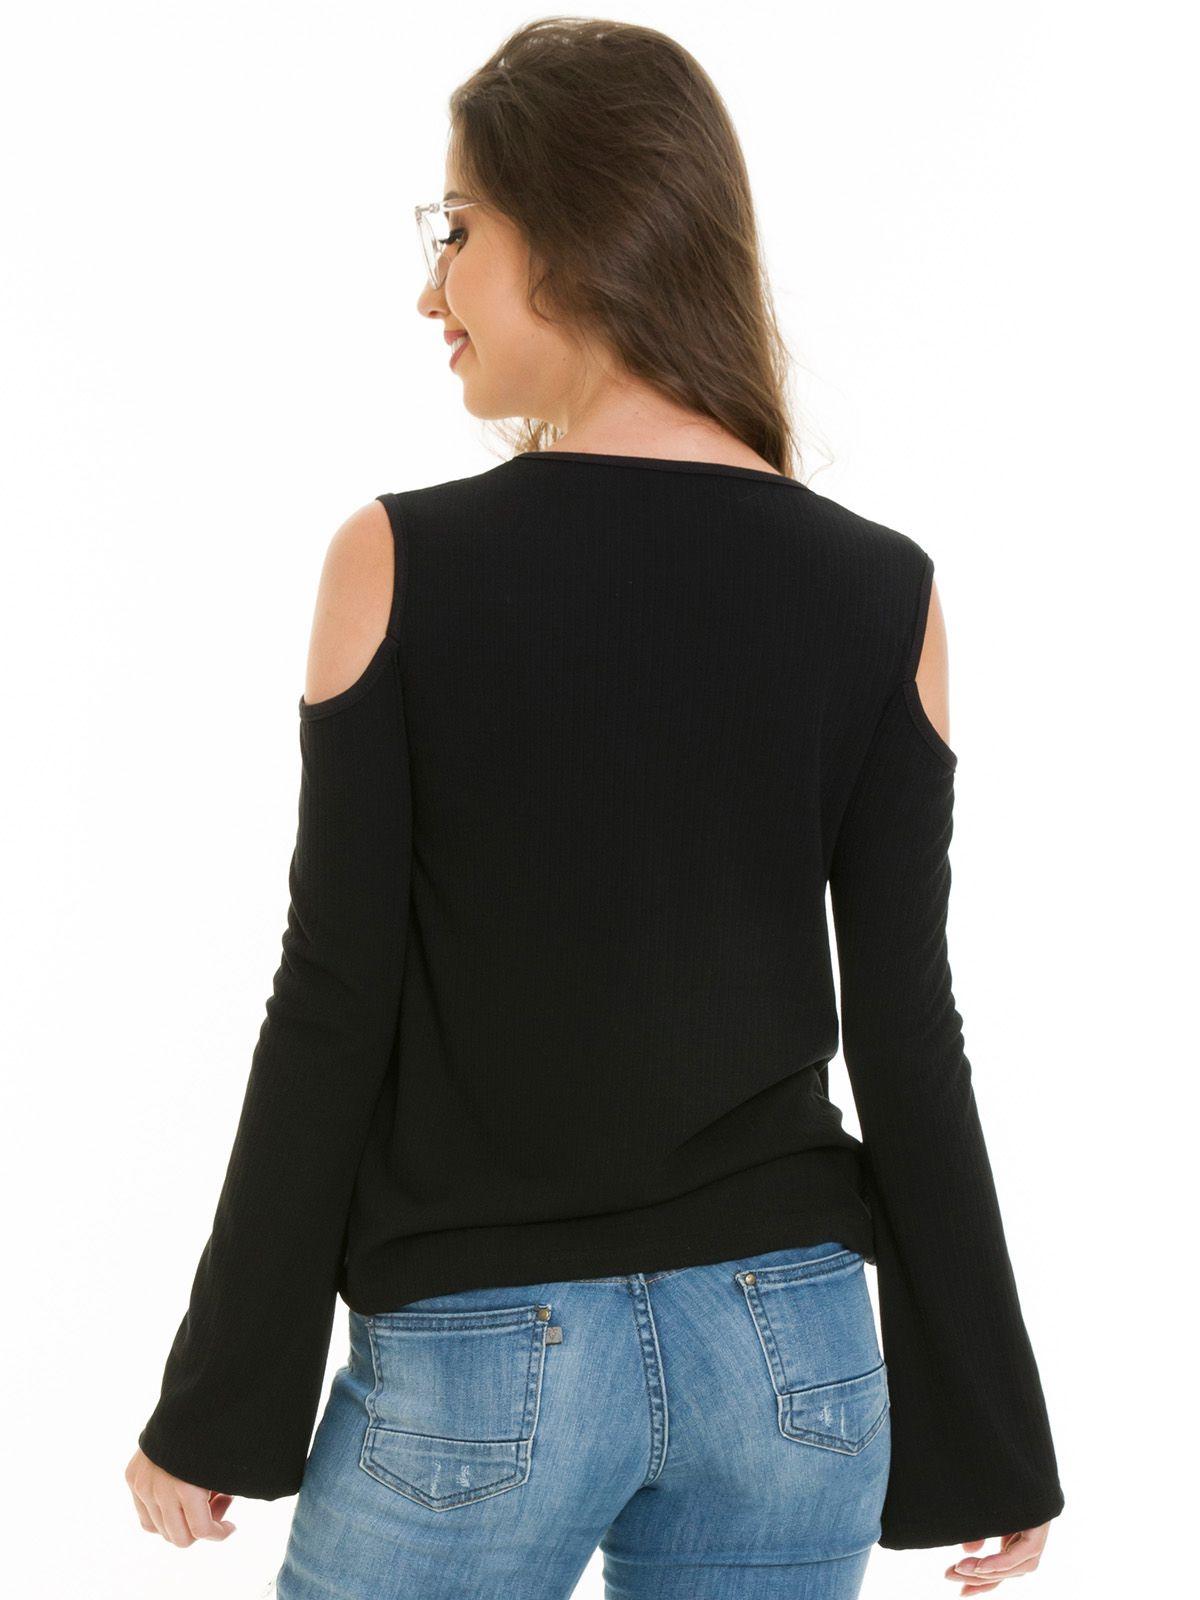 Blusa Ombro Vazado Preta